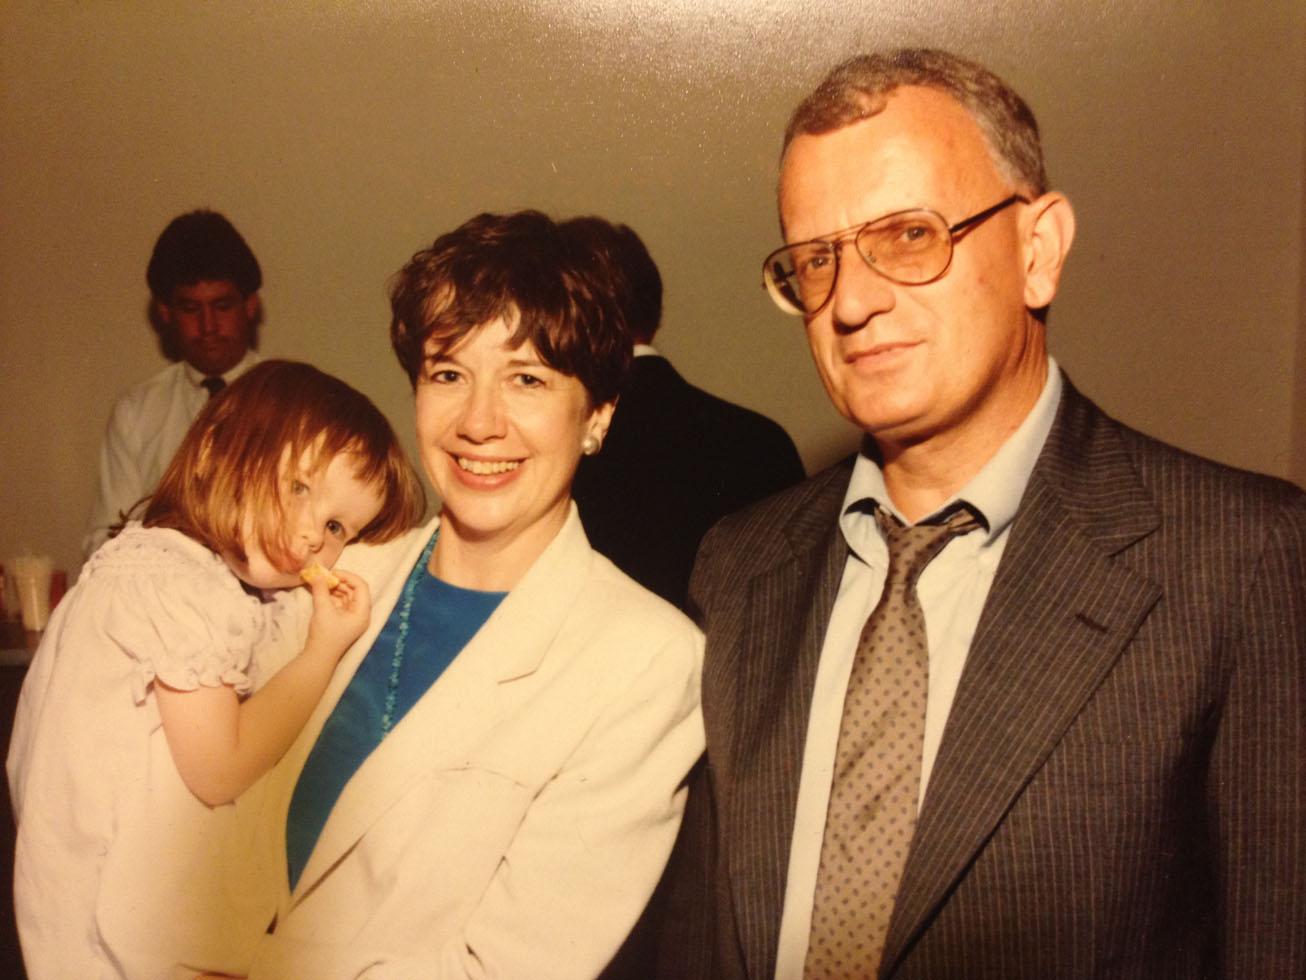 Mara Motey, Valerie Gerrard Browne, Archibald Motley III - family photo